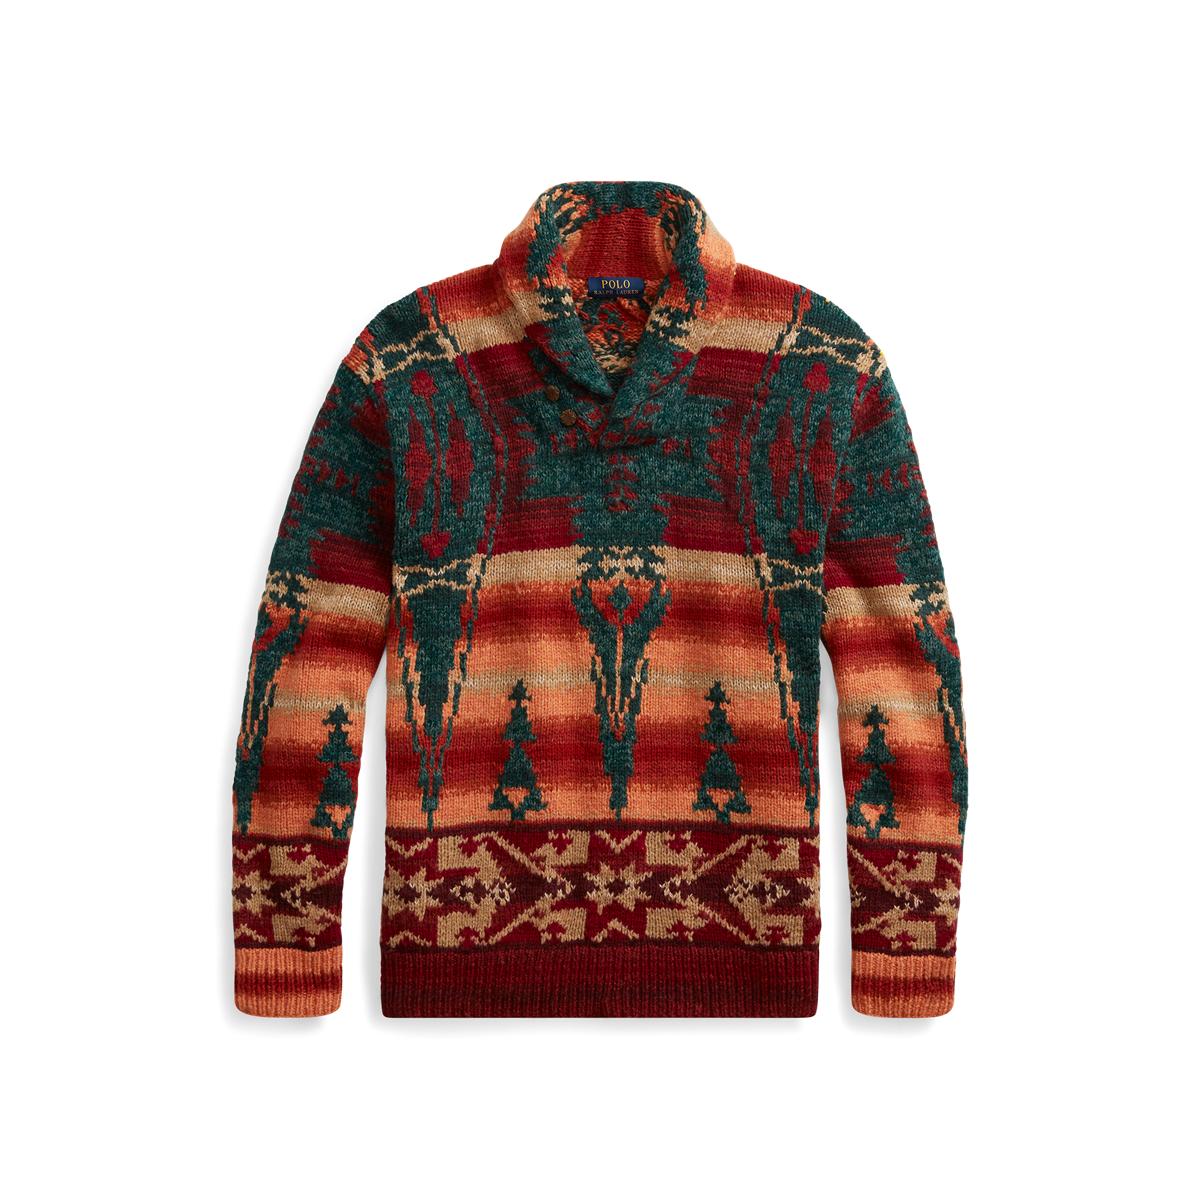 medio litro Acostado avance  Southwestern Shawl Sweater